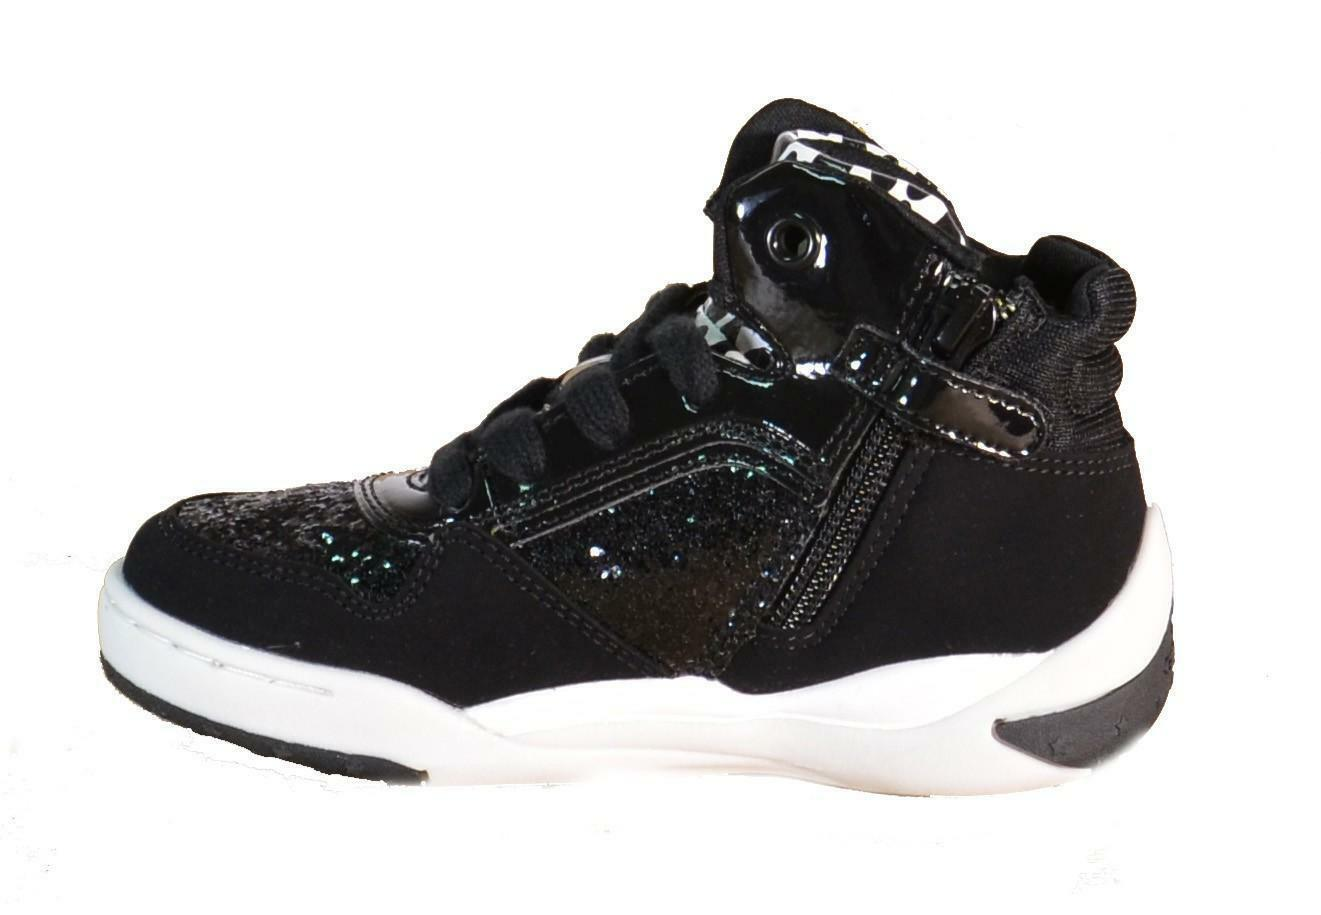 geox geox ayko scarpe bambina nere pelle j5401b